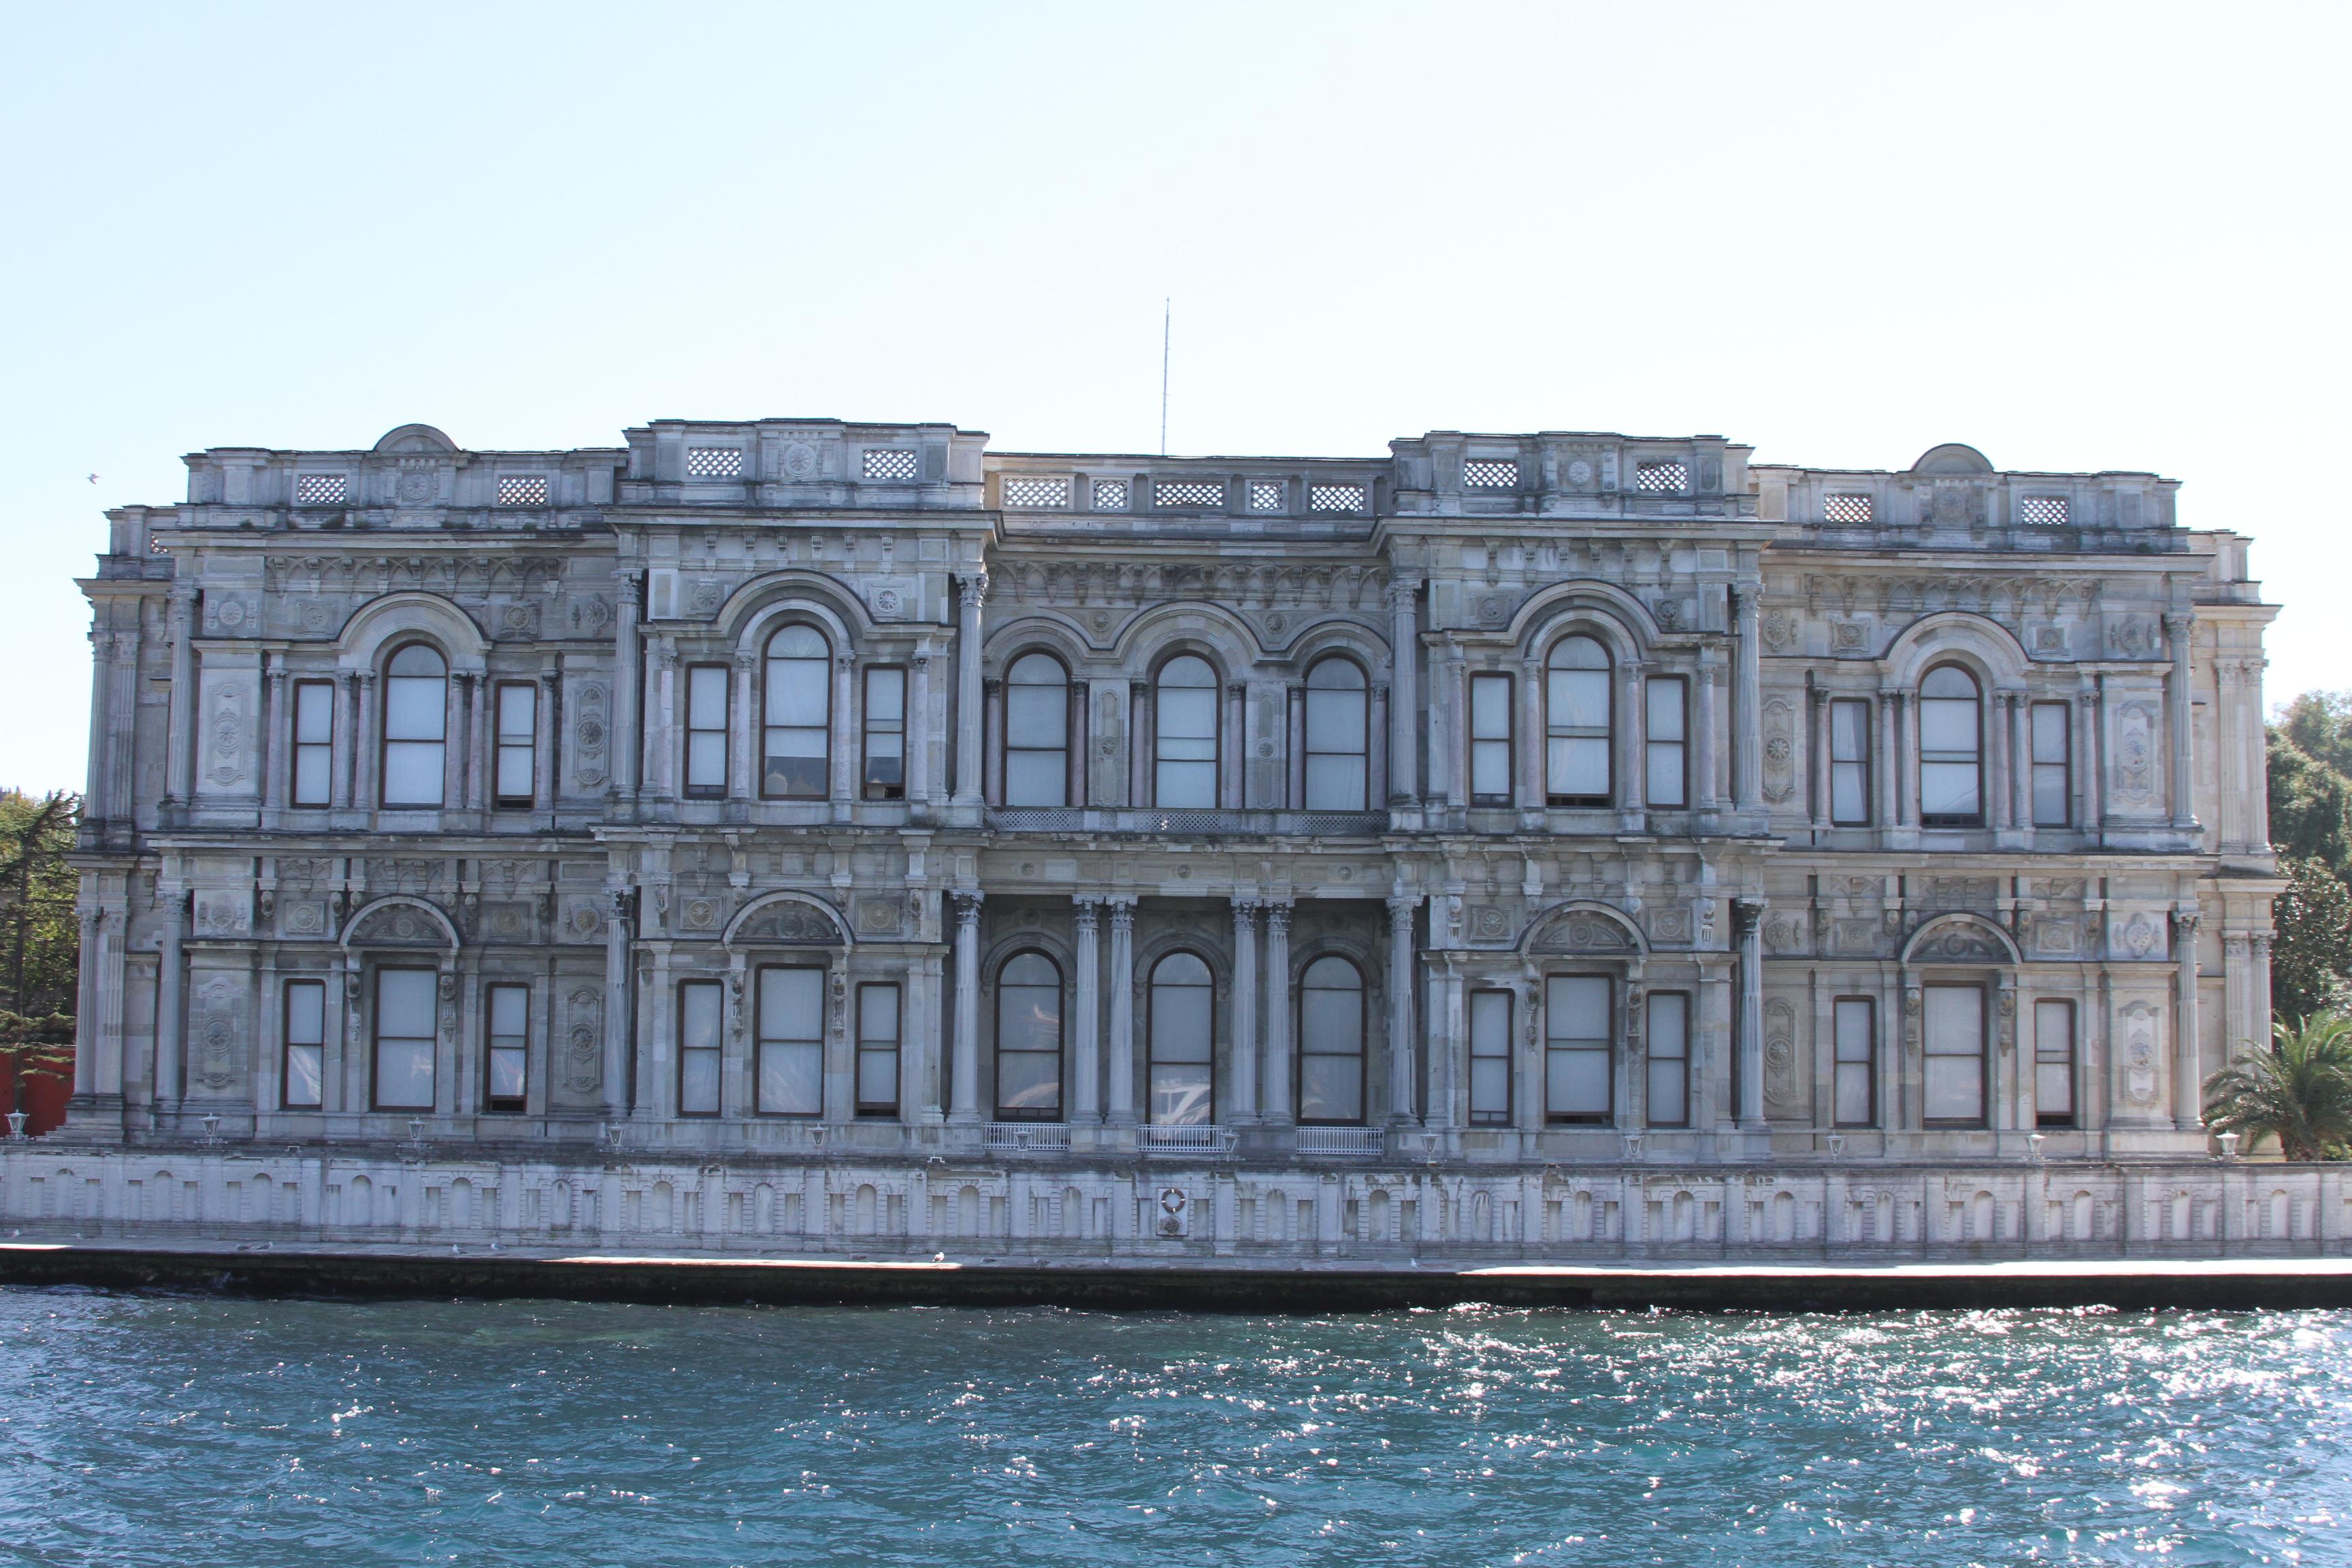 Exterior view of Beylerbeyi Palace from the Bosphorus (1).jpg